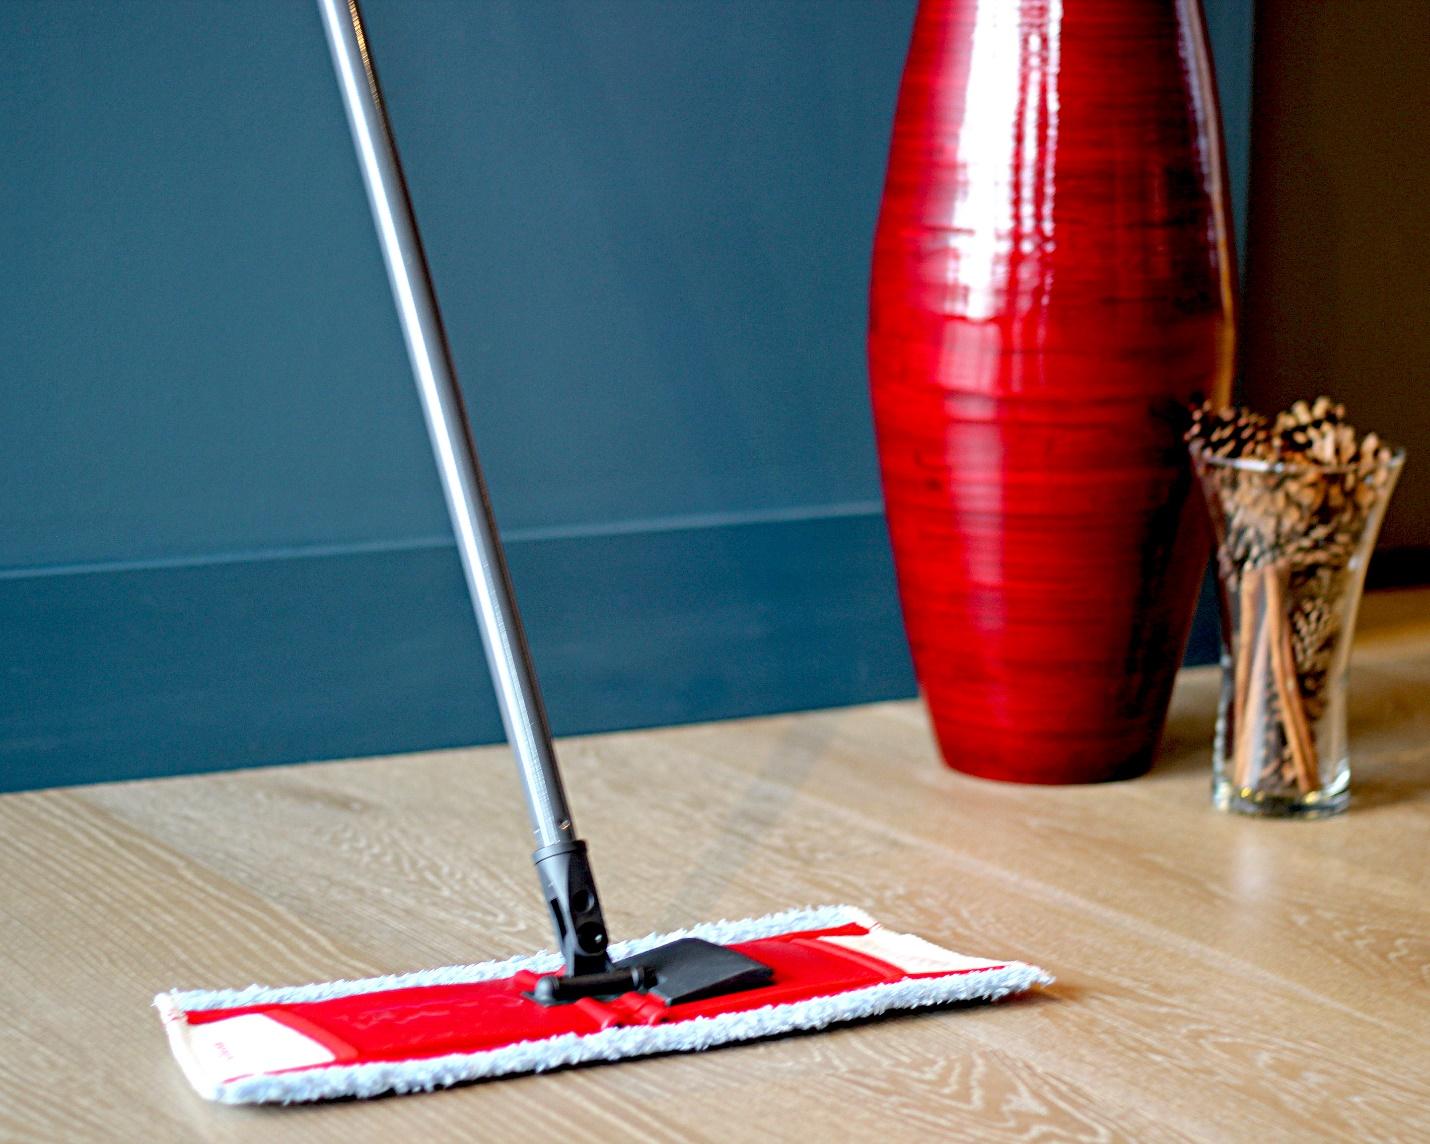 Clean your engineered hardwood flooring regularly